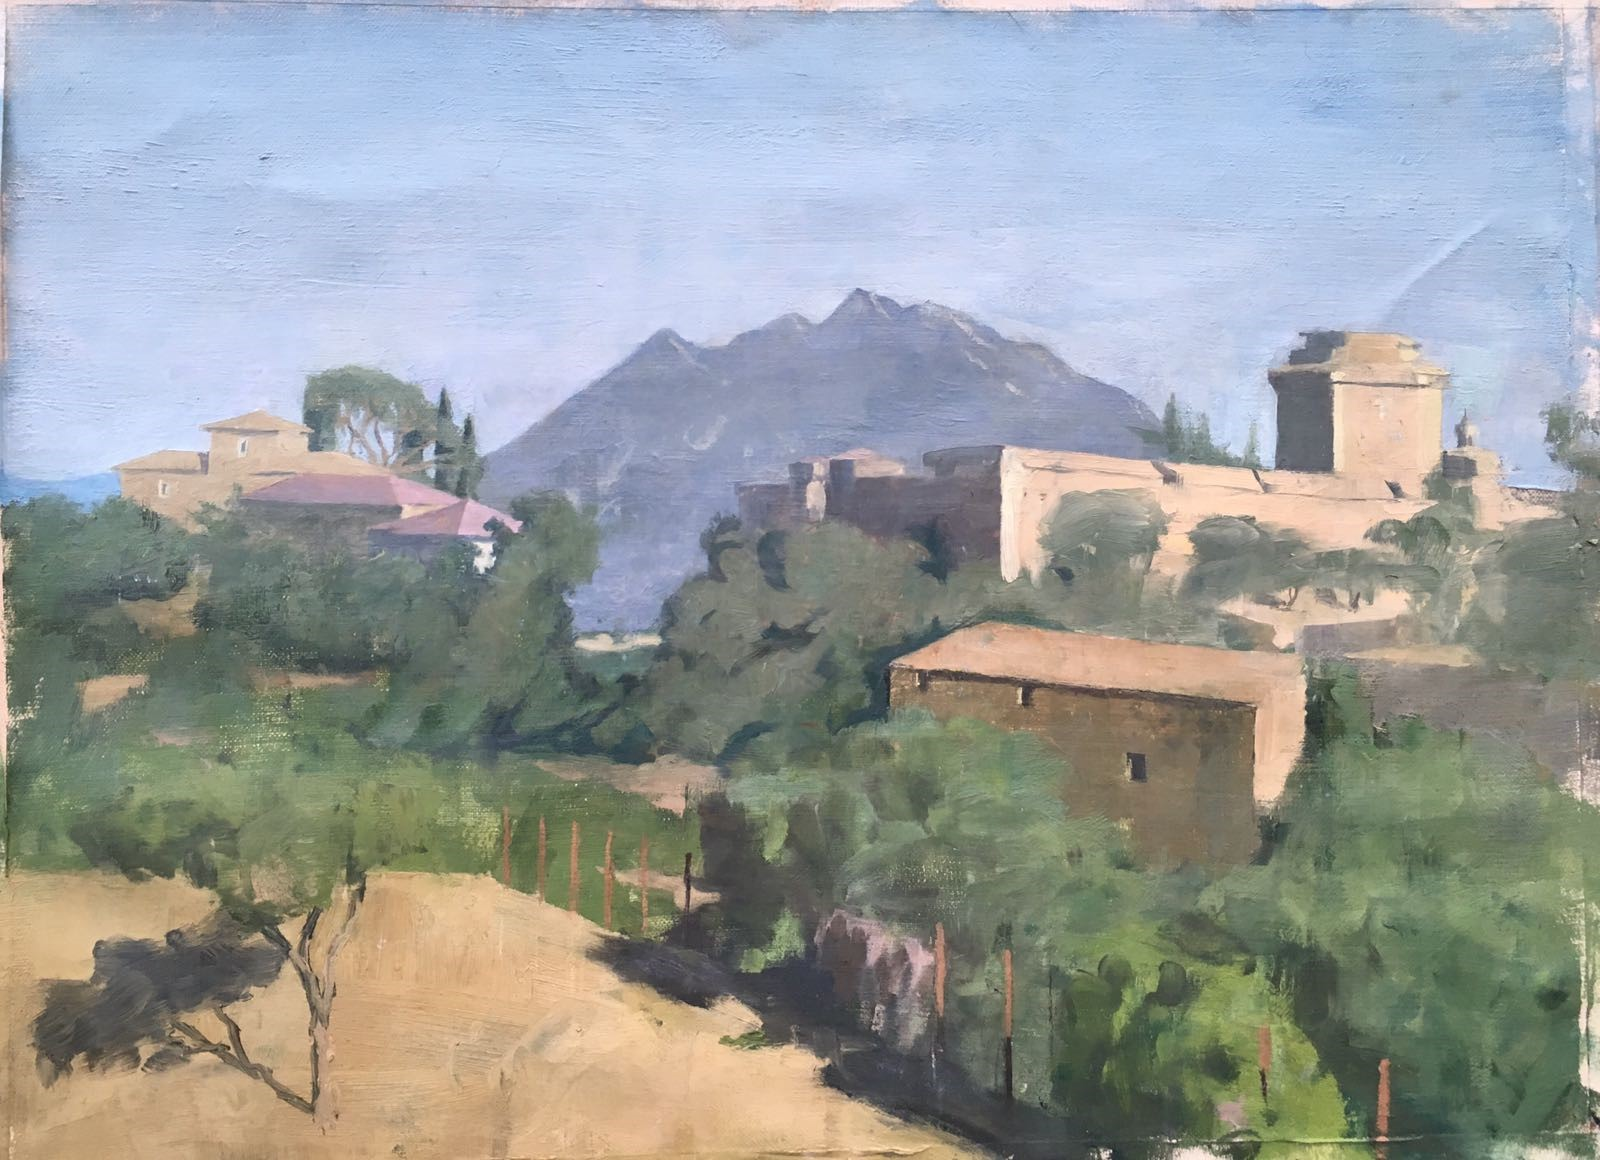 Monte Soratte Sam Rachamin Oil on linen mounted on wood 43 x 63 cm